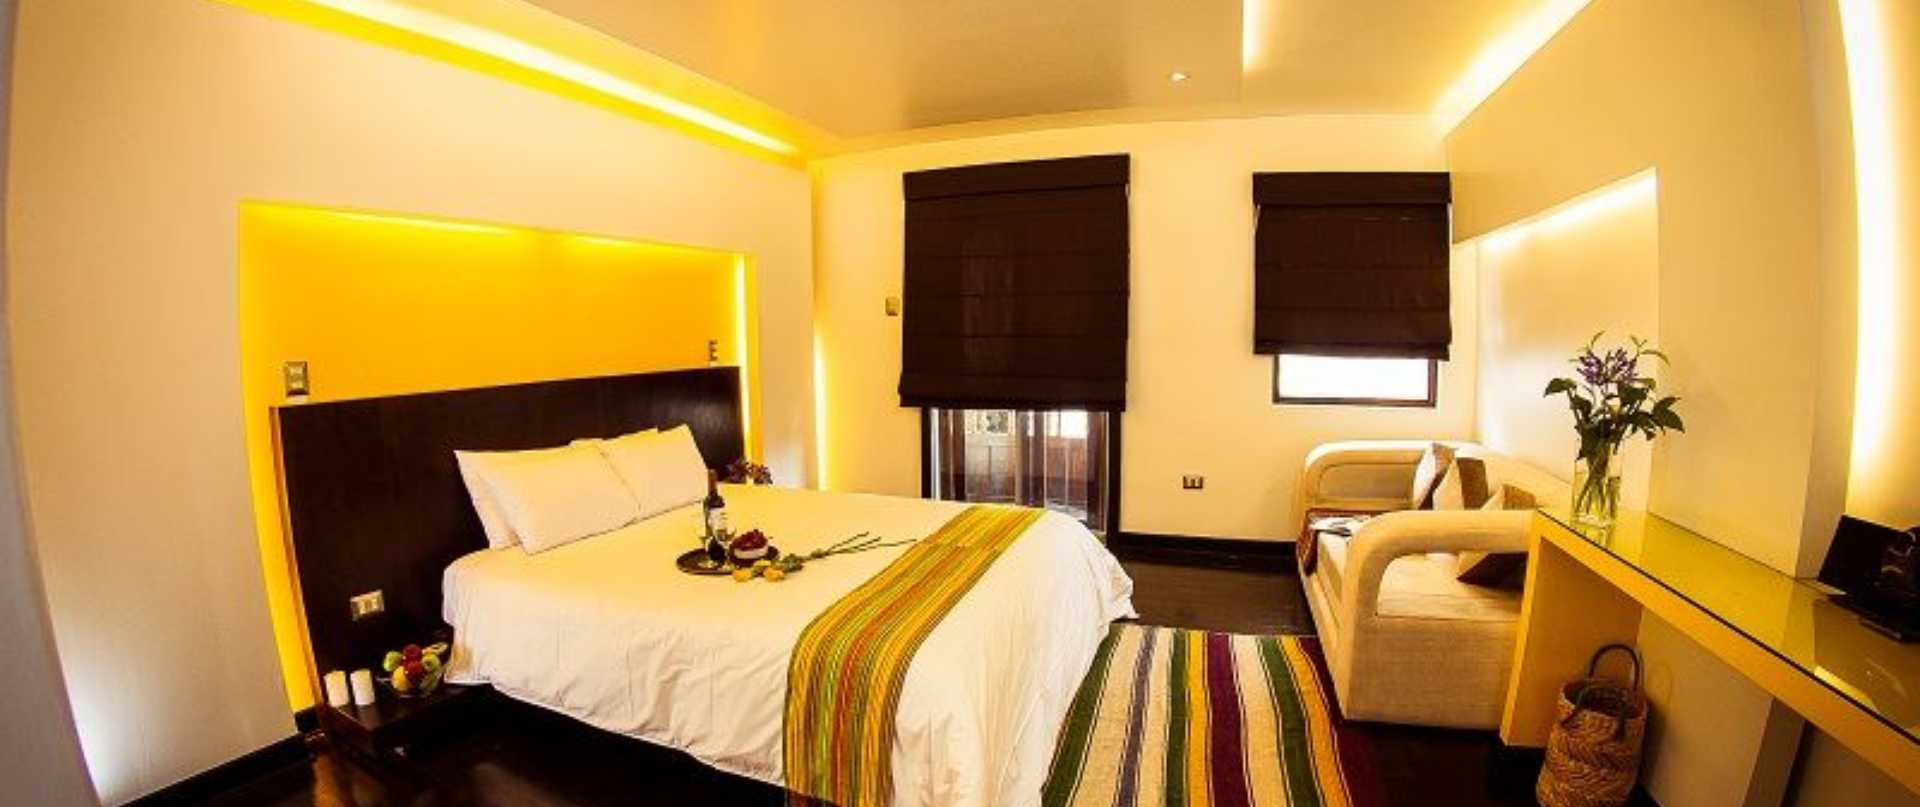 Hotel_WakaPunku